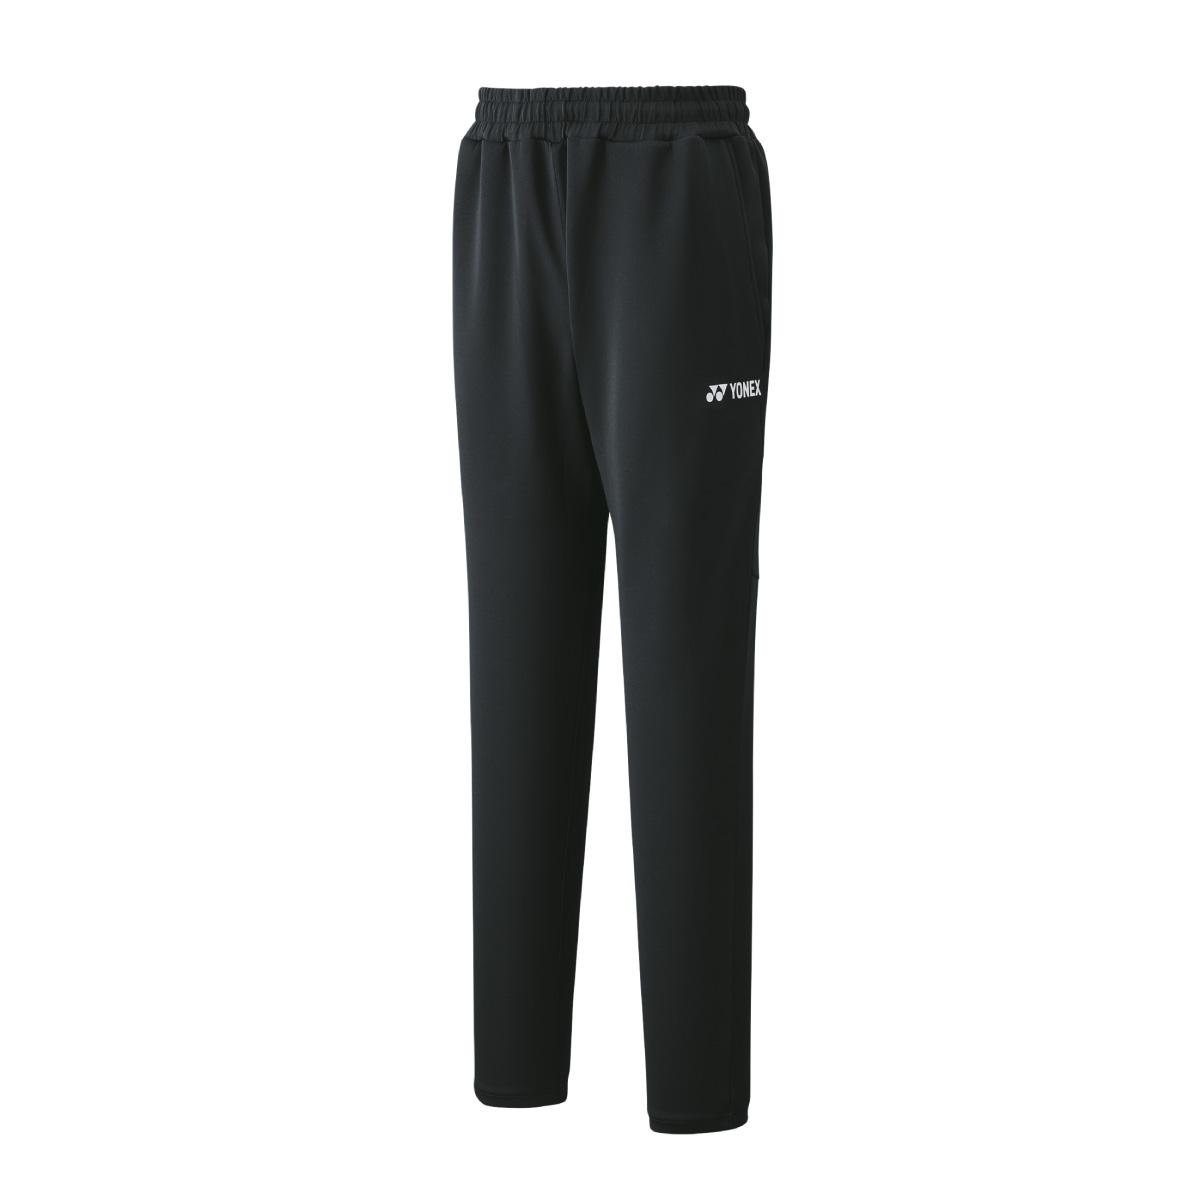 YONEX - Men's Warm-up Pants, Practice #60099Detailbild - 0